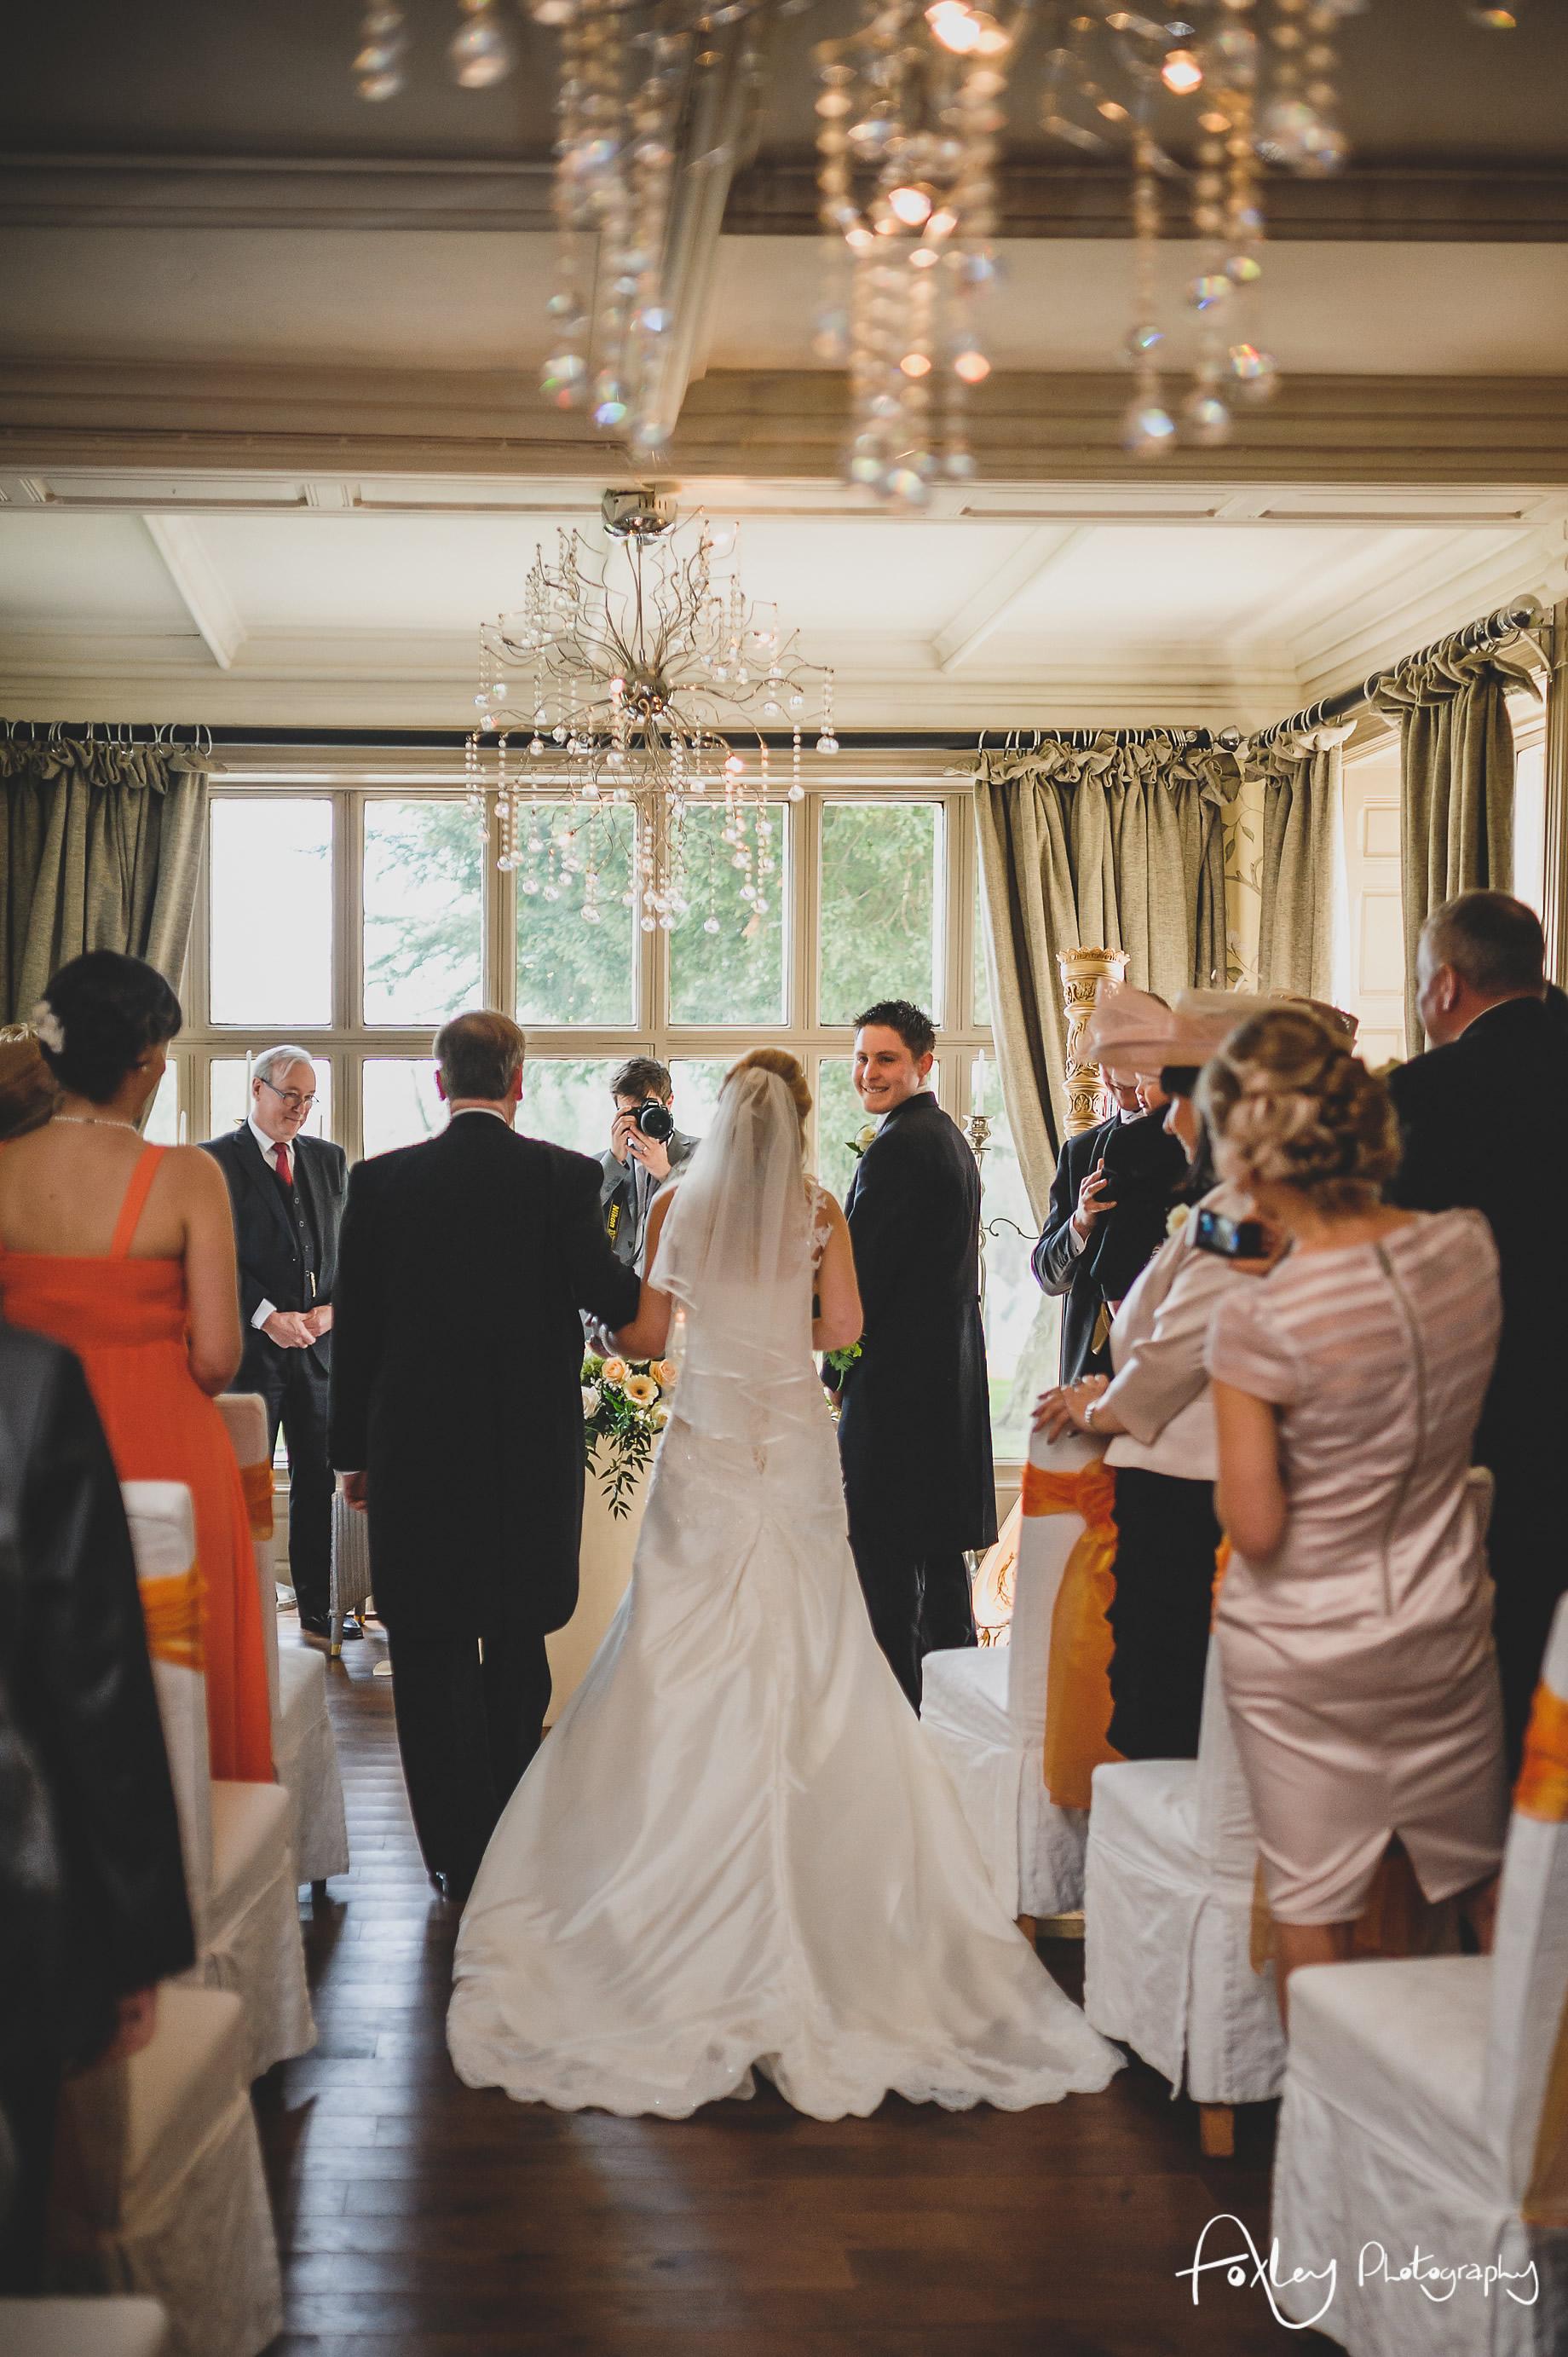 Gemma and Lewis' Wedding at Mitton Hall 072